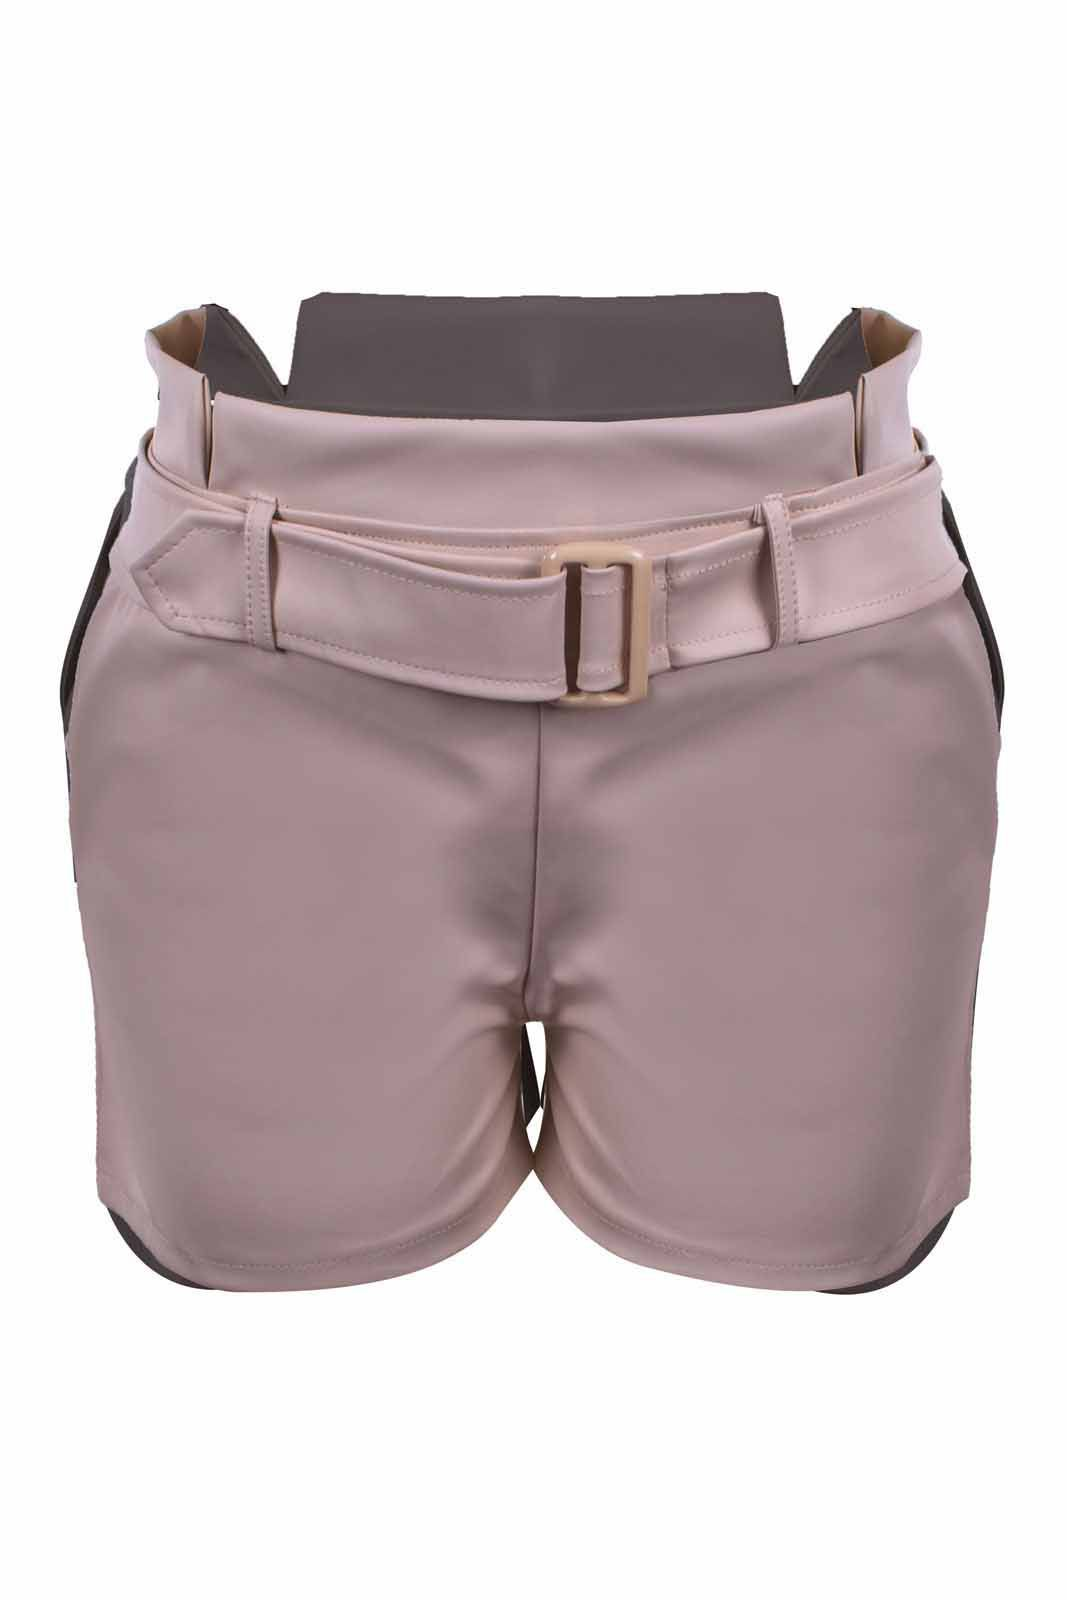 Short Outlet Dri Curto Co Clochard Detalhe Passante Cinto Rosa